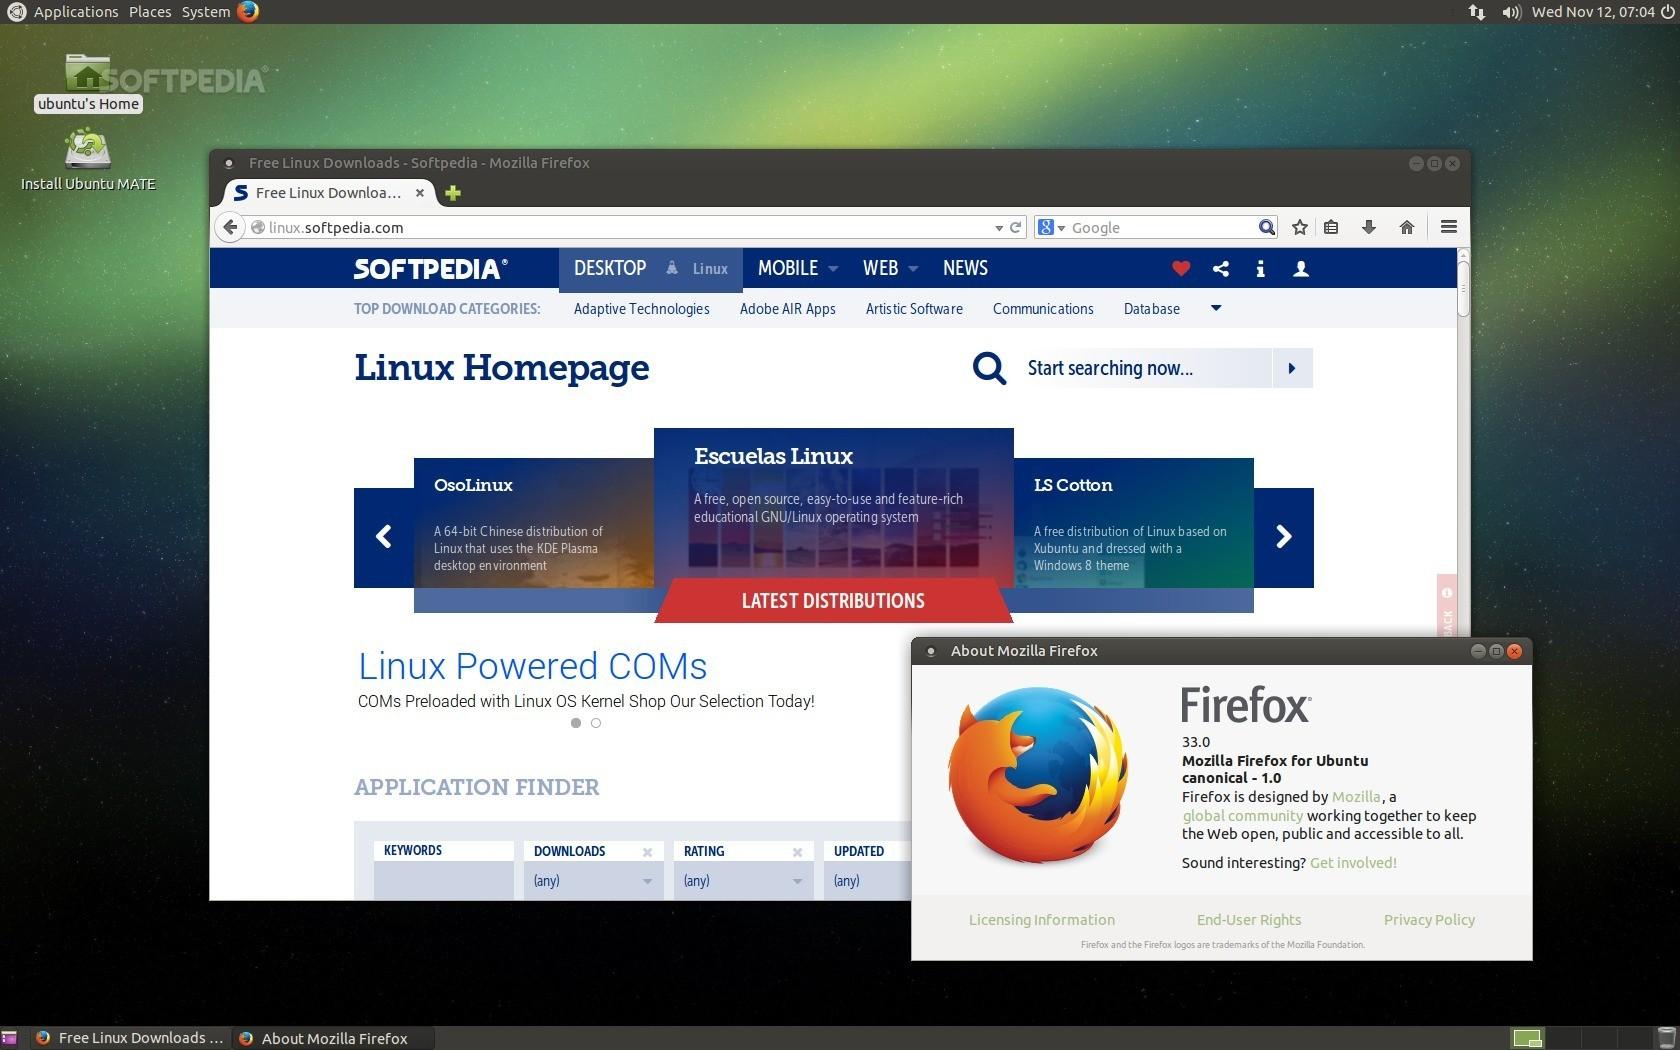 how to download itunes on ubuntu 14.04